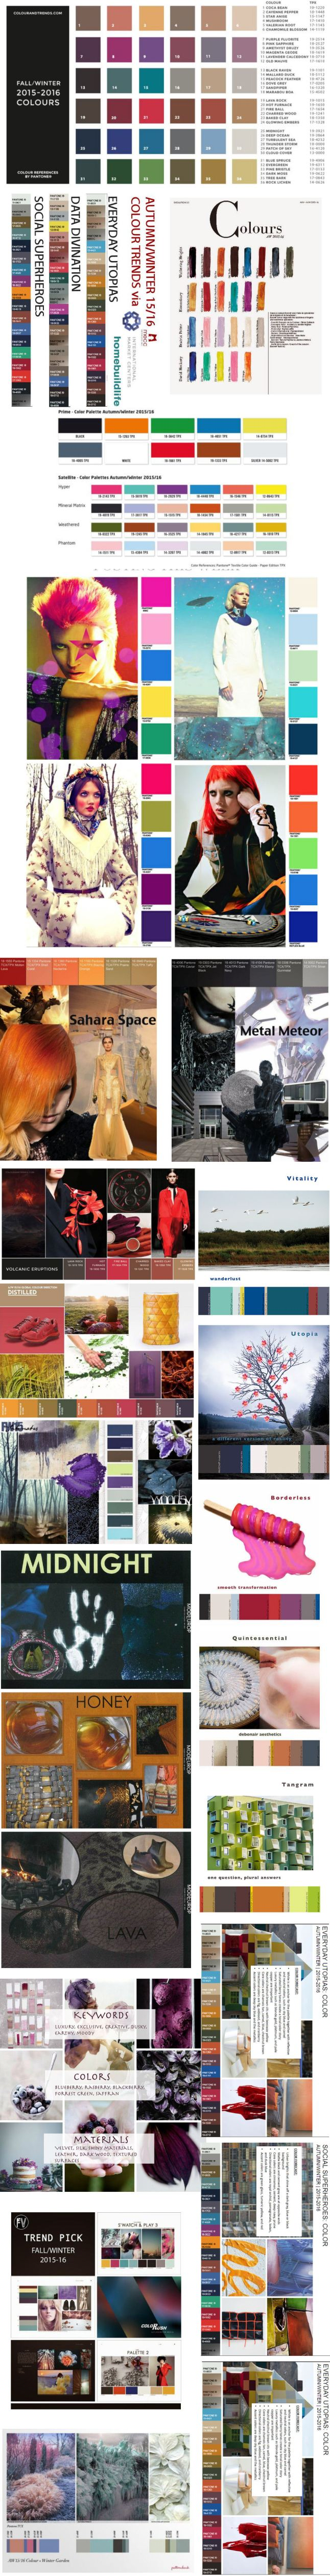 tuesday trending: autumn/winter 15/16 | @meccinteriors | design bites